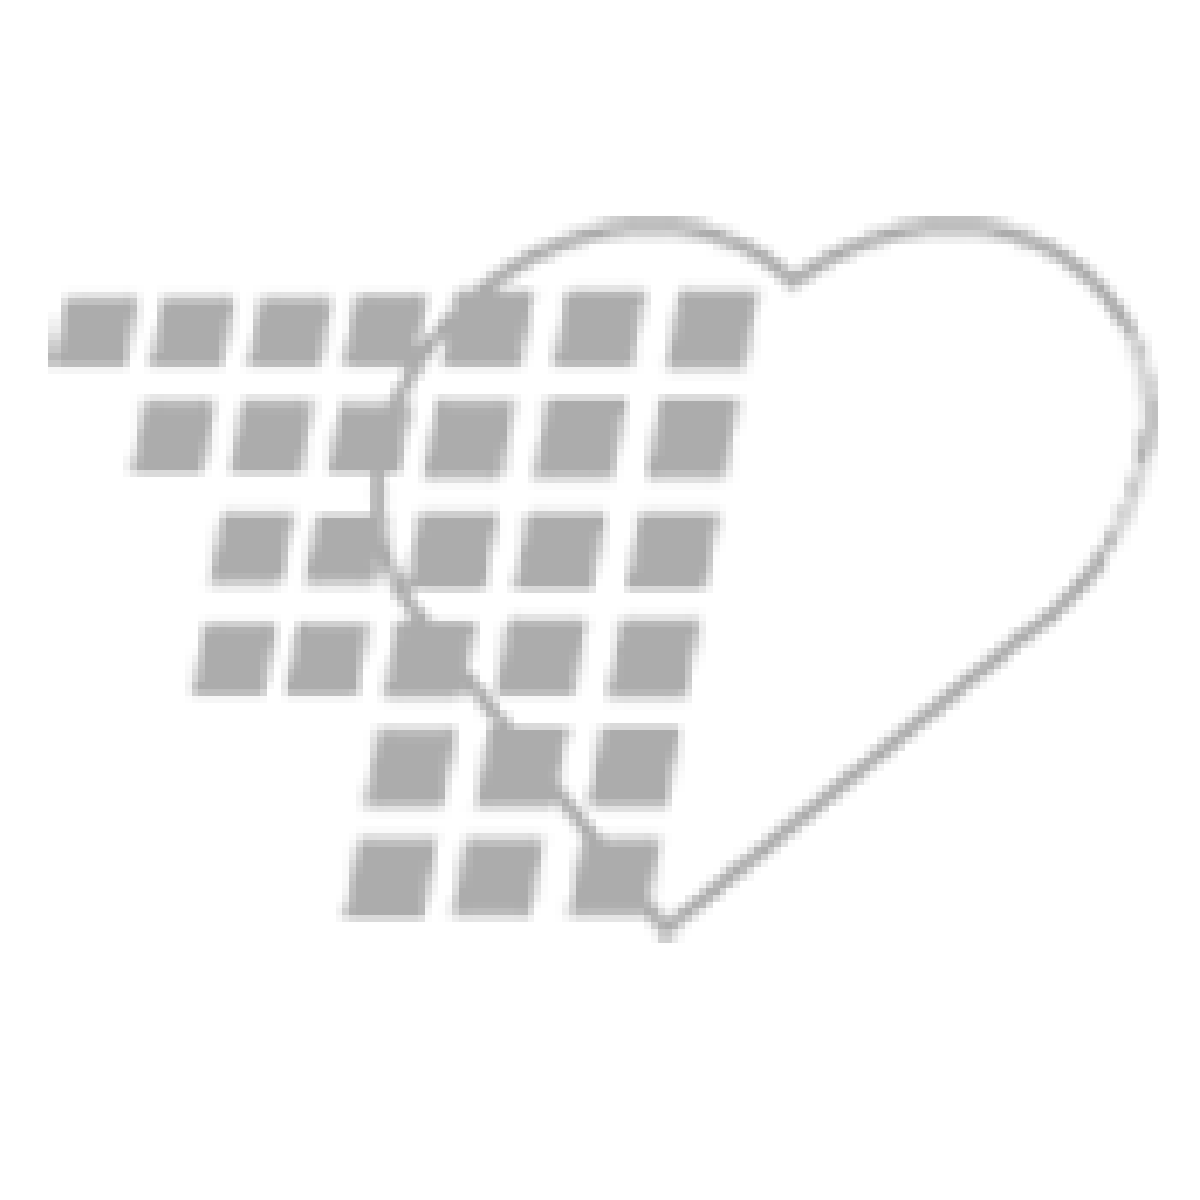 06-93-0080 - Demo Dose® Hydroxyzin Paomat 25 mg - 1000 Pills/Jar